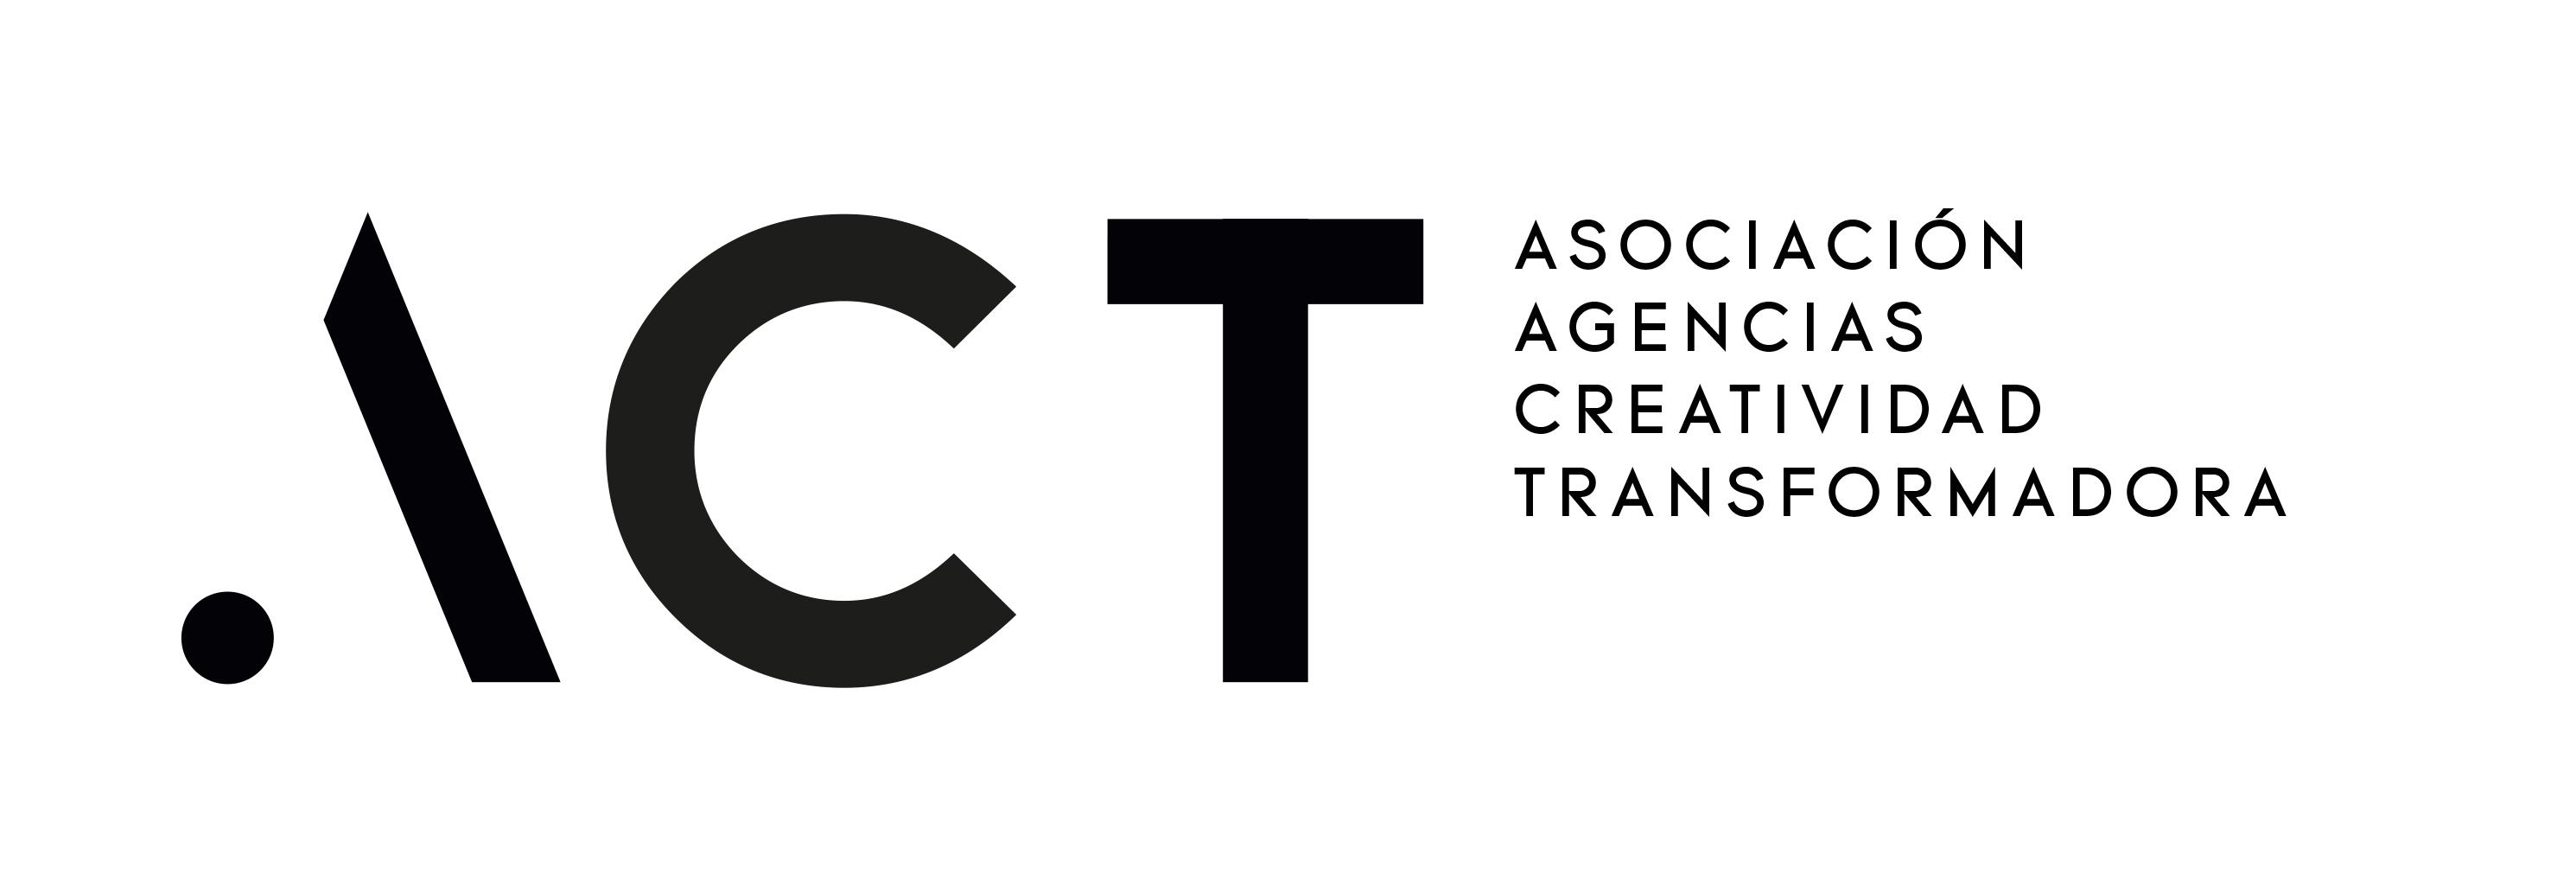 Asociación Agencias de Creatividad Transformadora